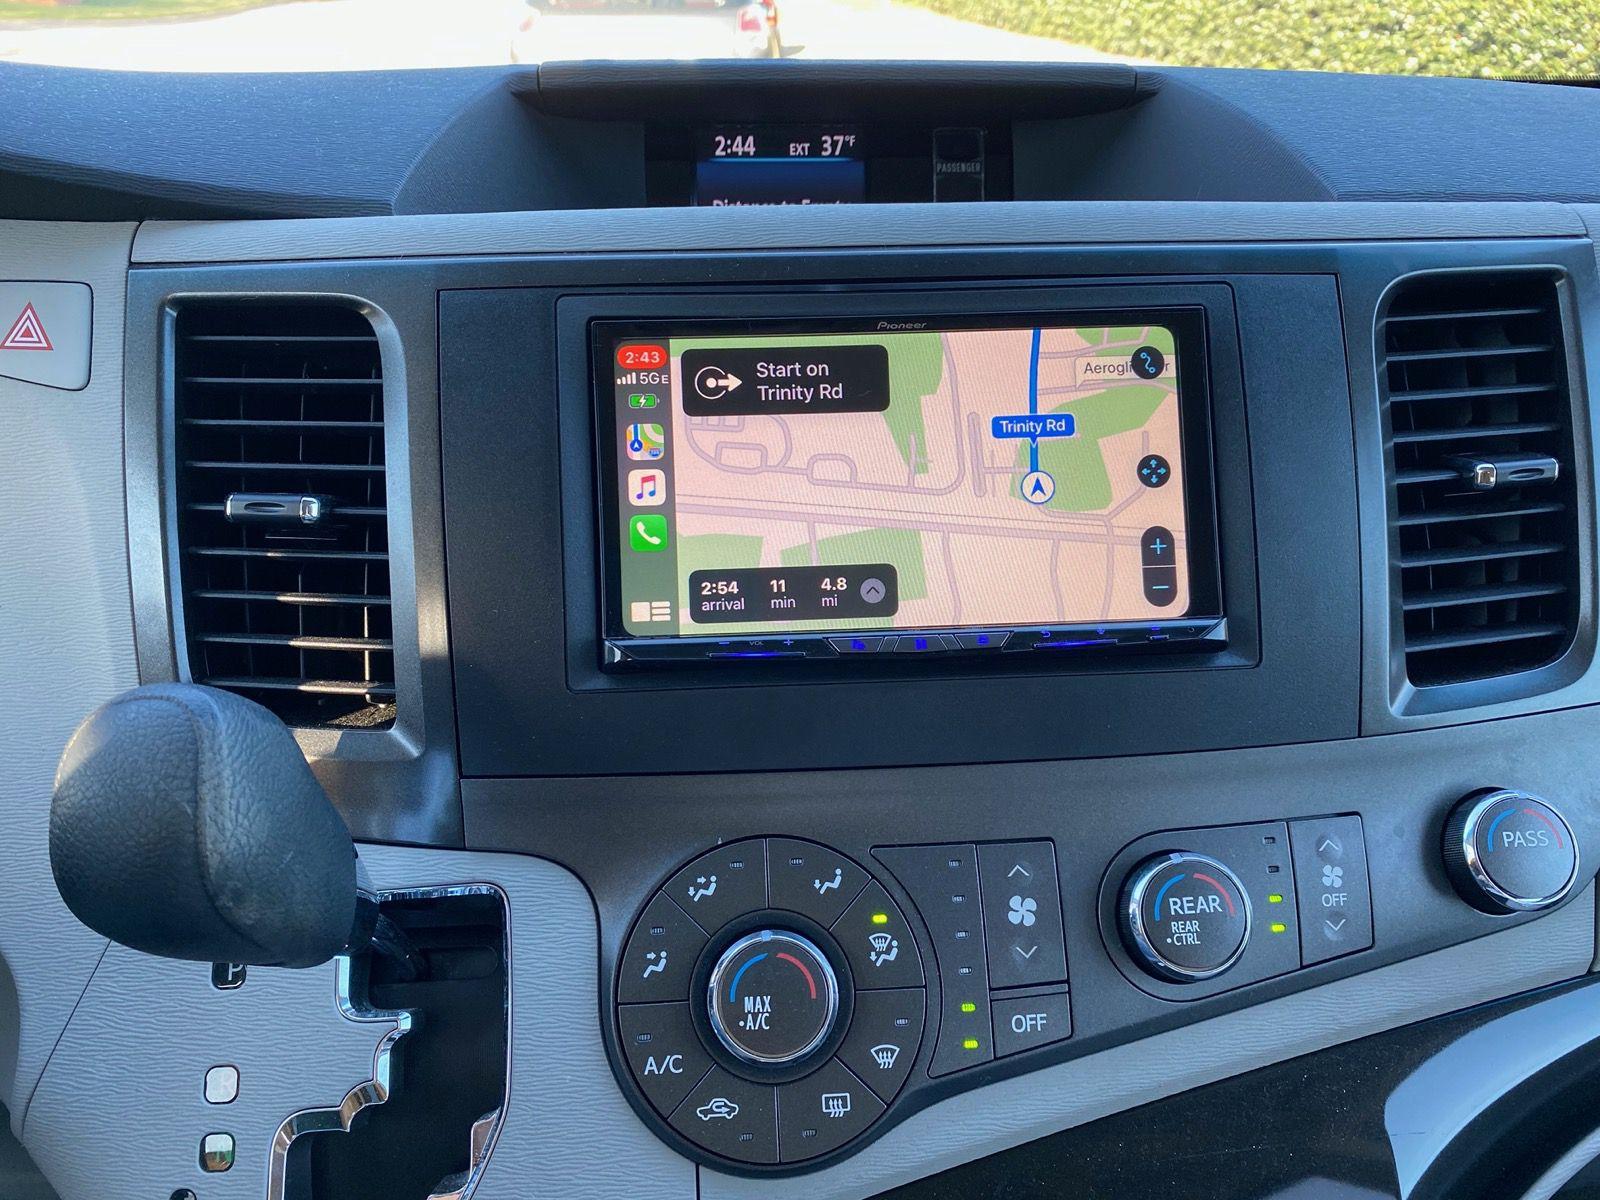 Avic W8500nex In Dash Receiver Review Macrumors